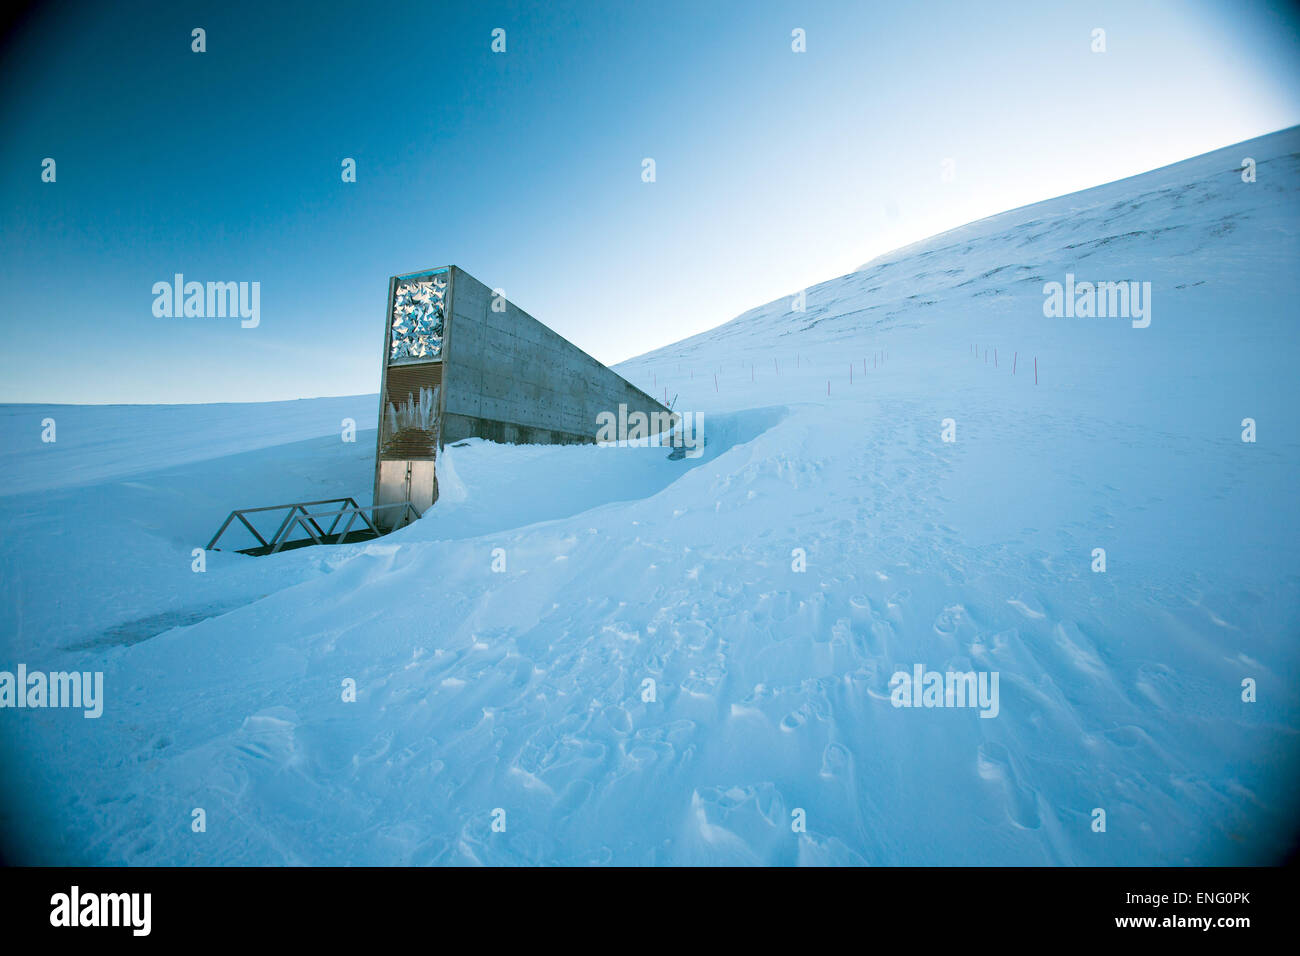 Spitsbergen, Norway. 08th Apr, 2015. The entrance to the international gene bank Svalbard Global Seed Vault (SGSV) - Stock Image